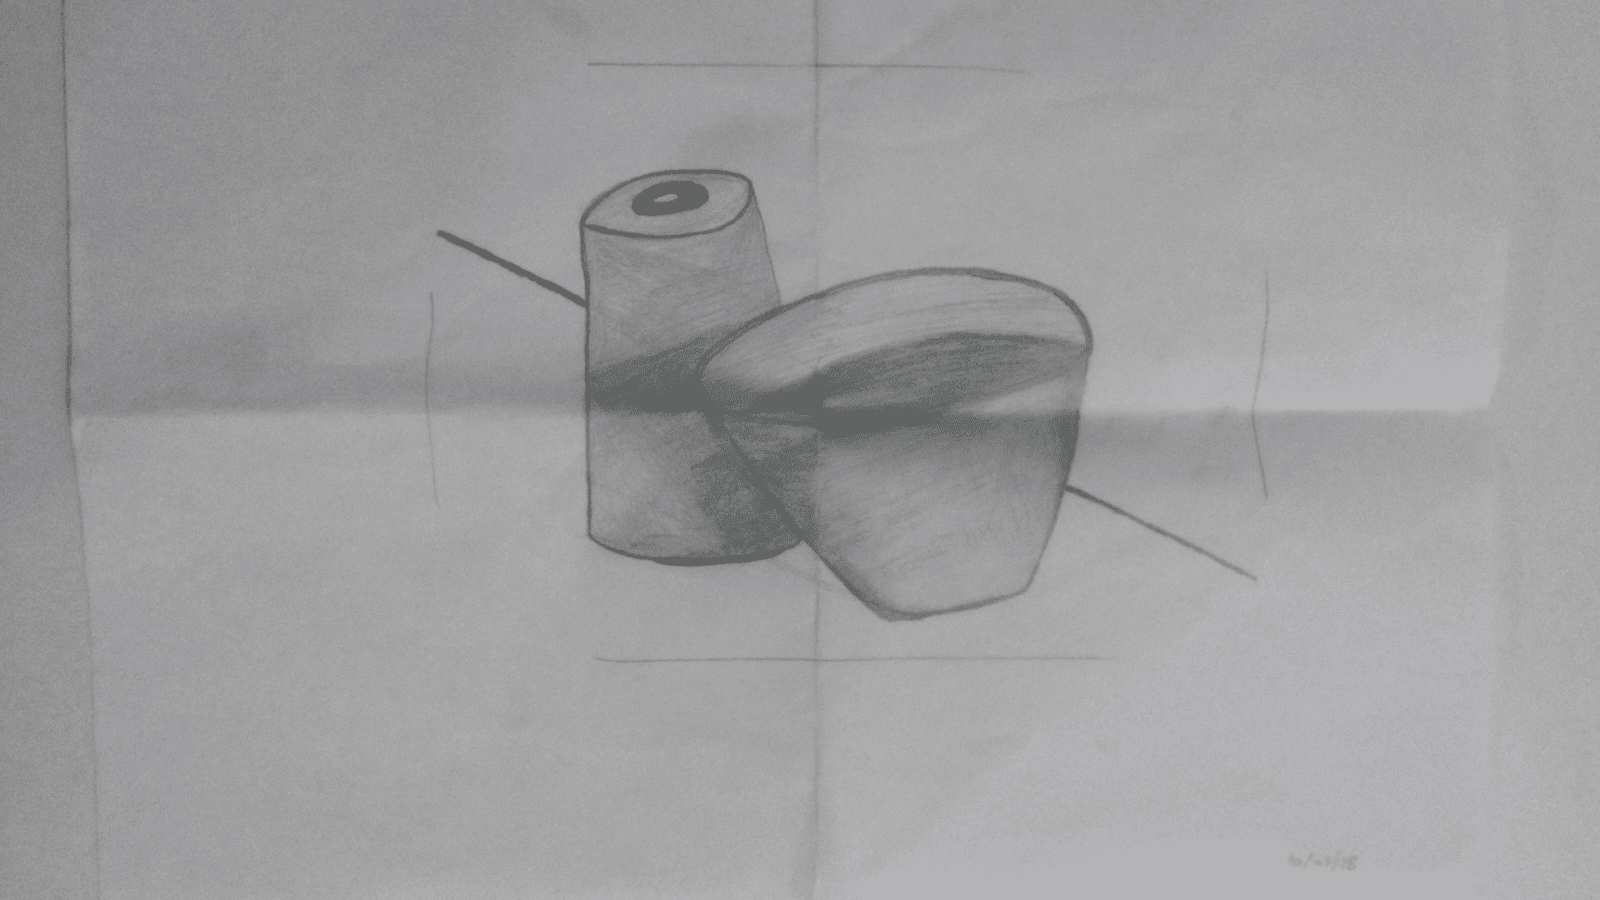 resim 2